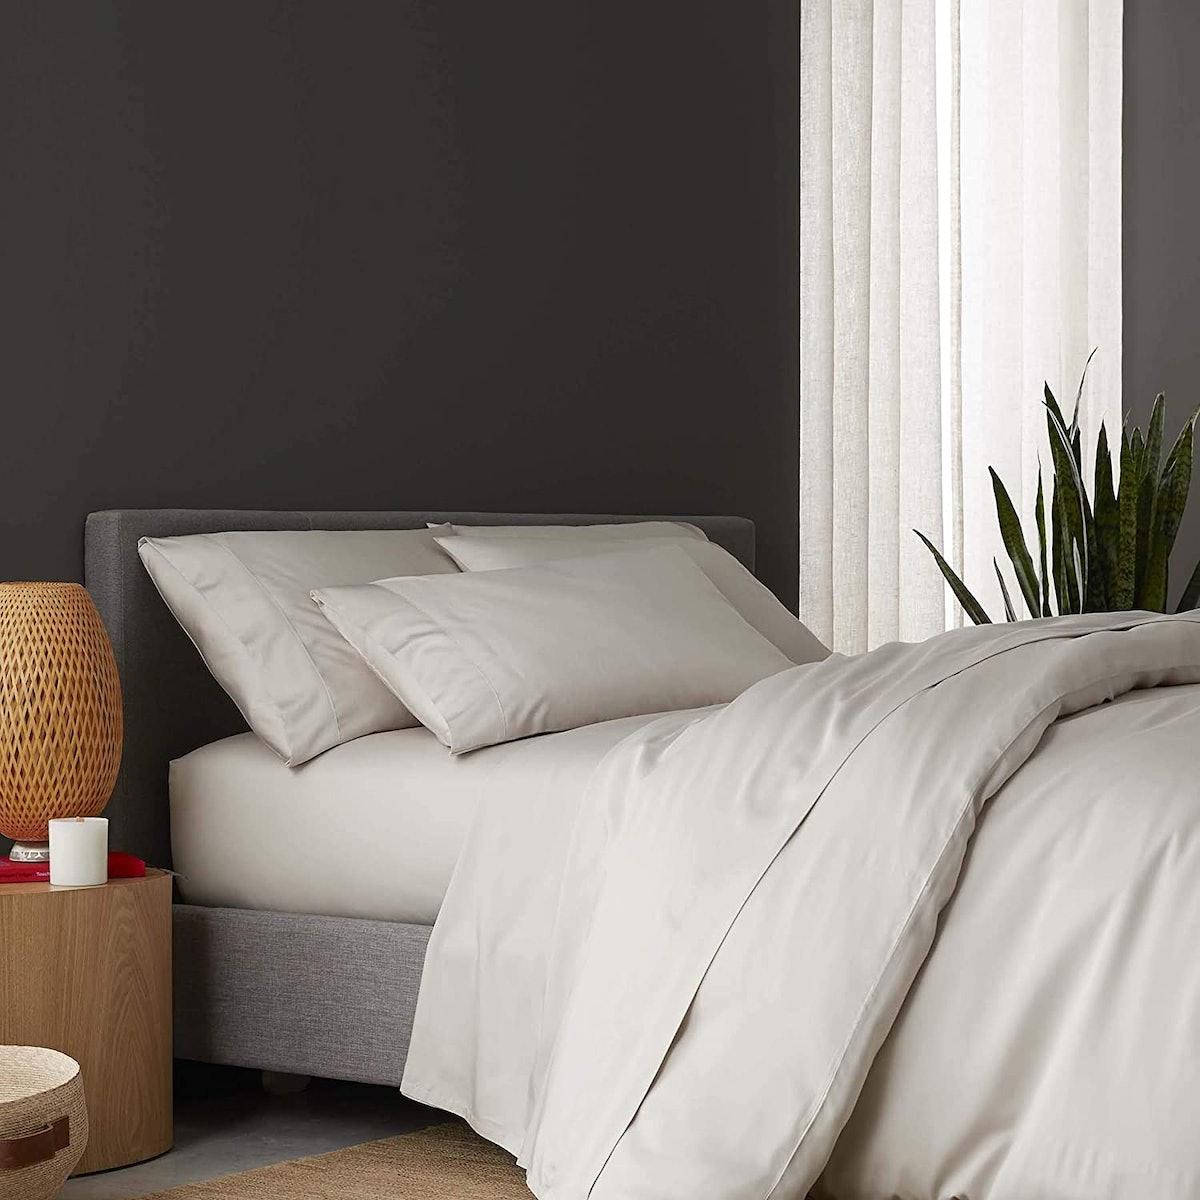 Sijo Premium 100% Bamboo Lyocell Bed Sheet Set